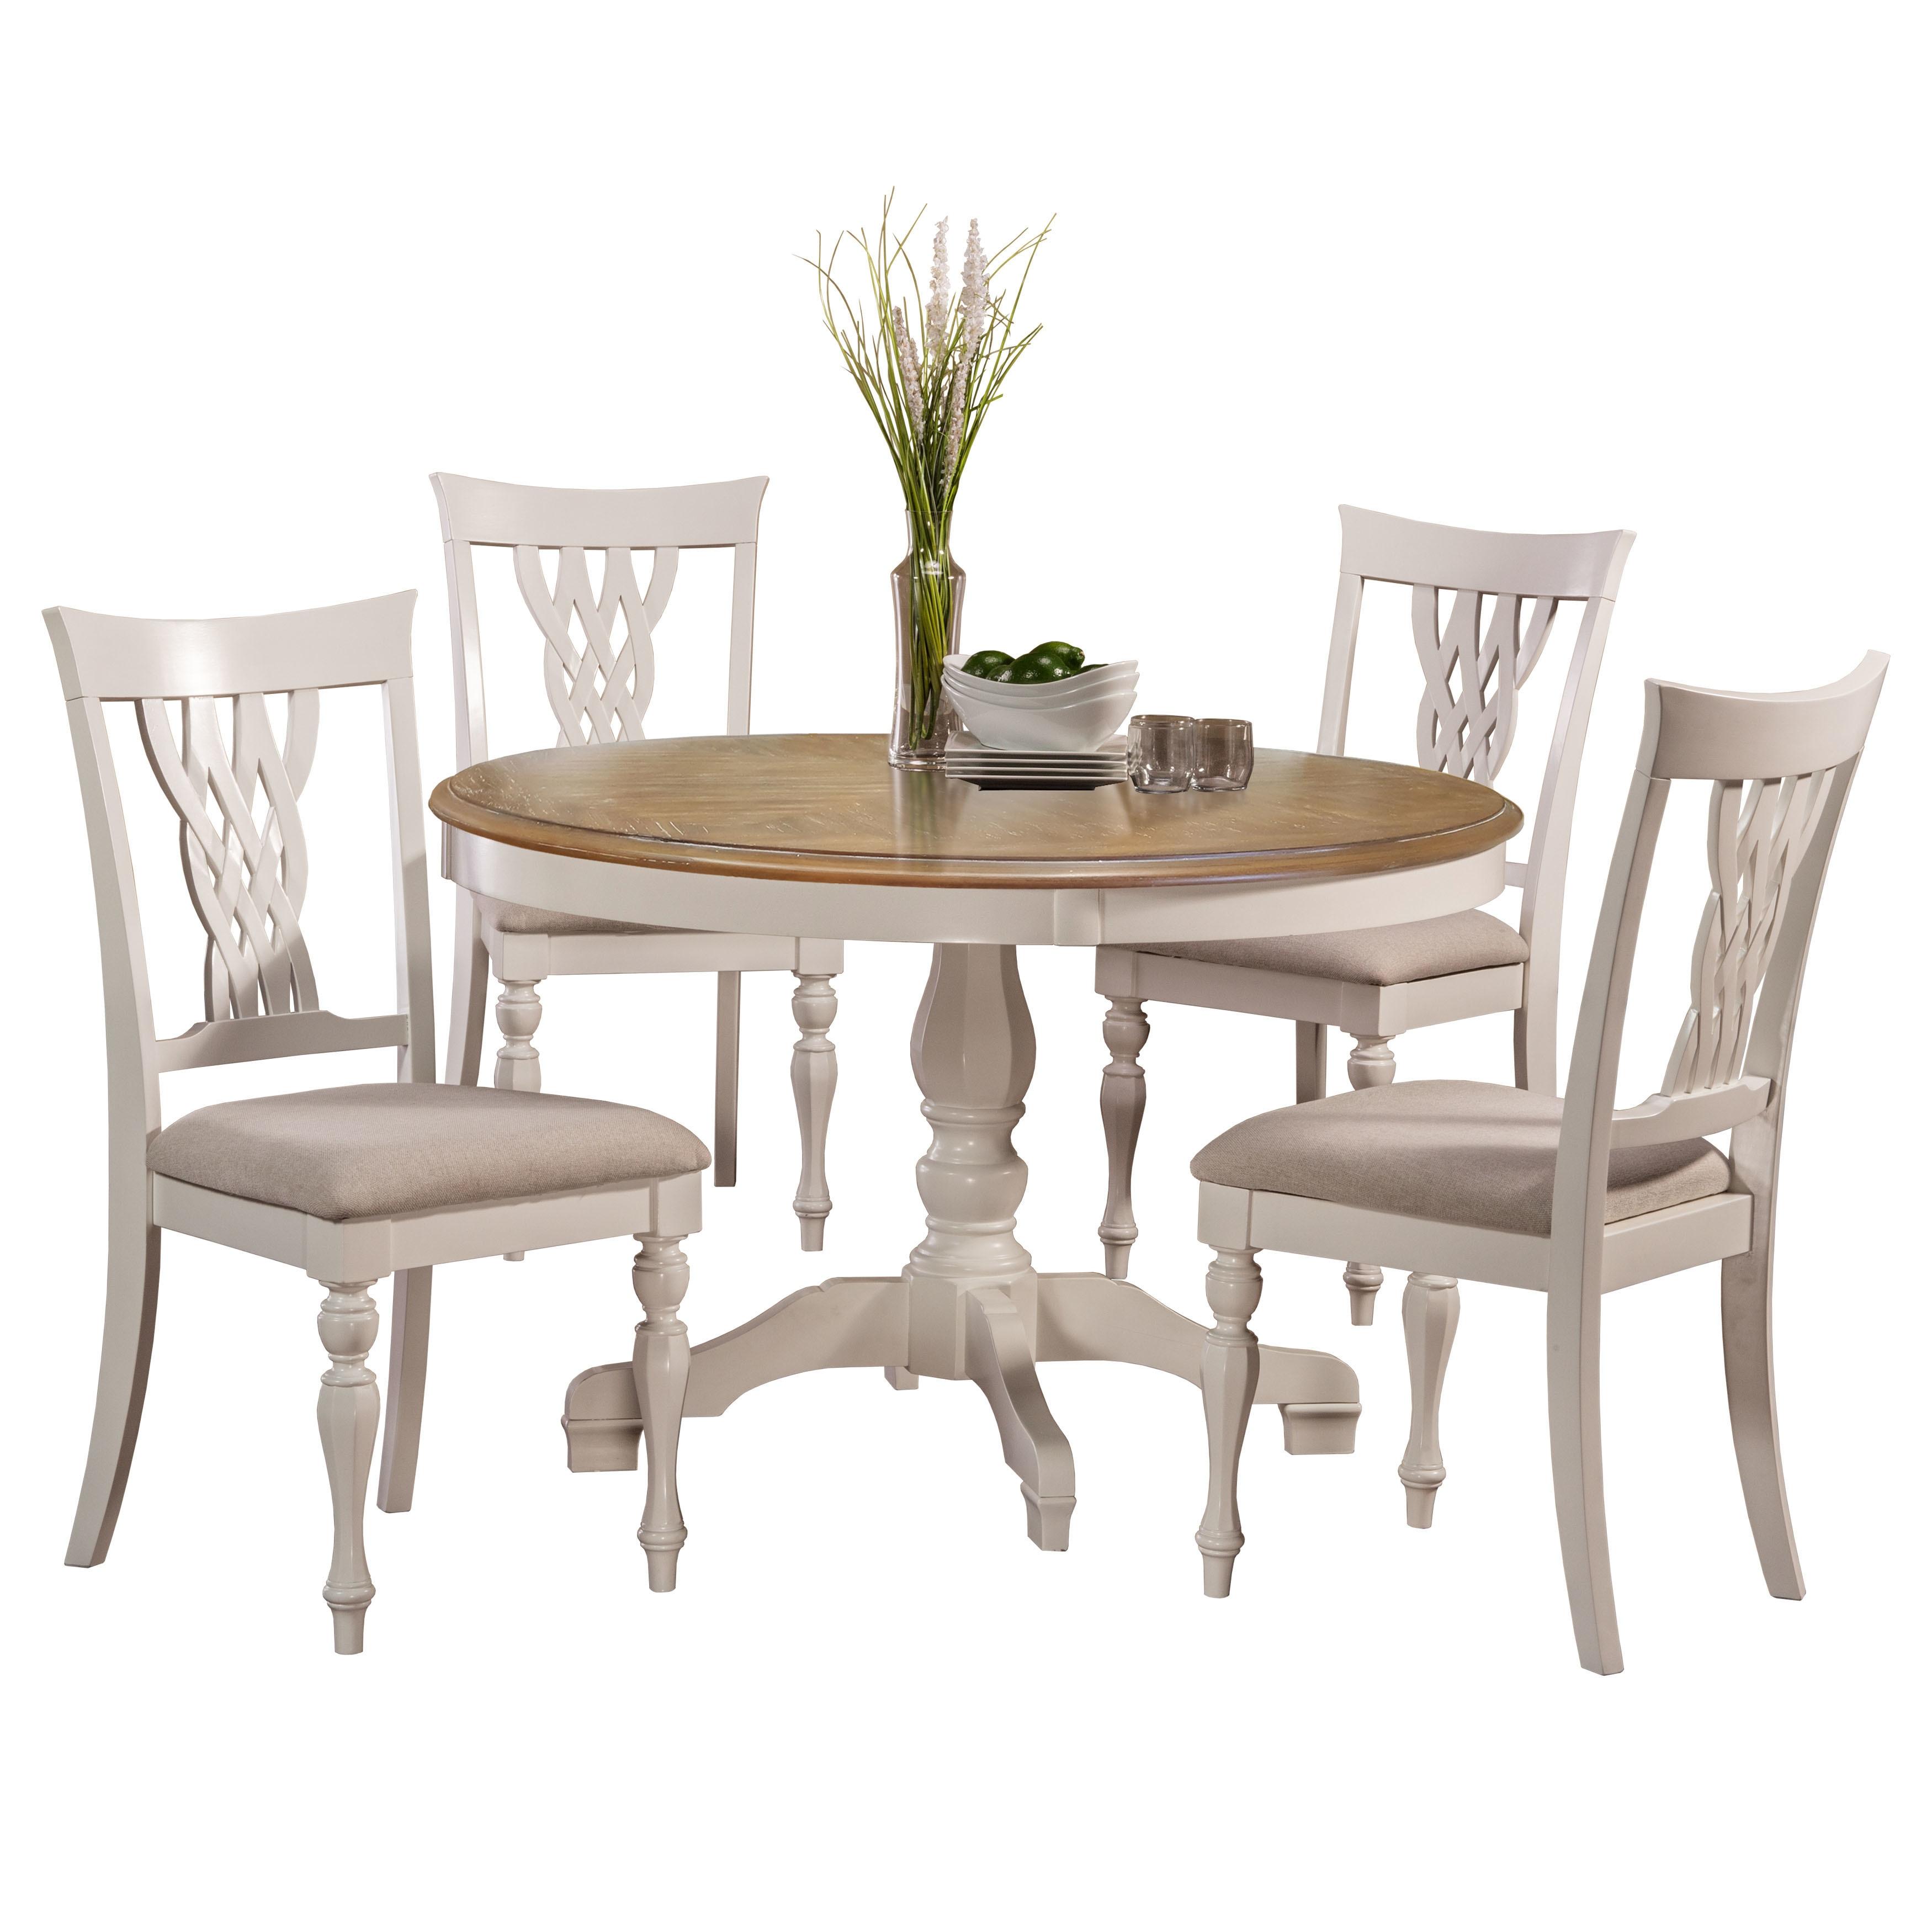 Hillsdale Furniture Embassy White 5 Piece Round Dining Set Overstock 16294838